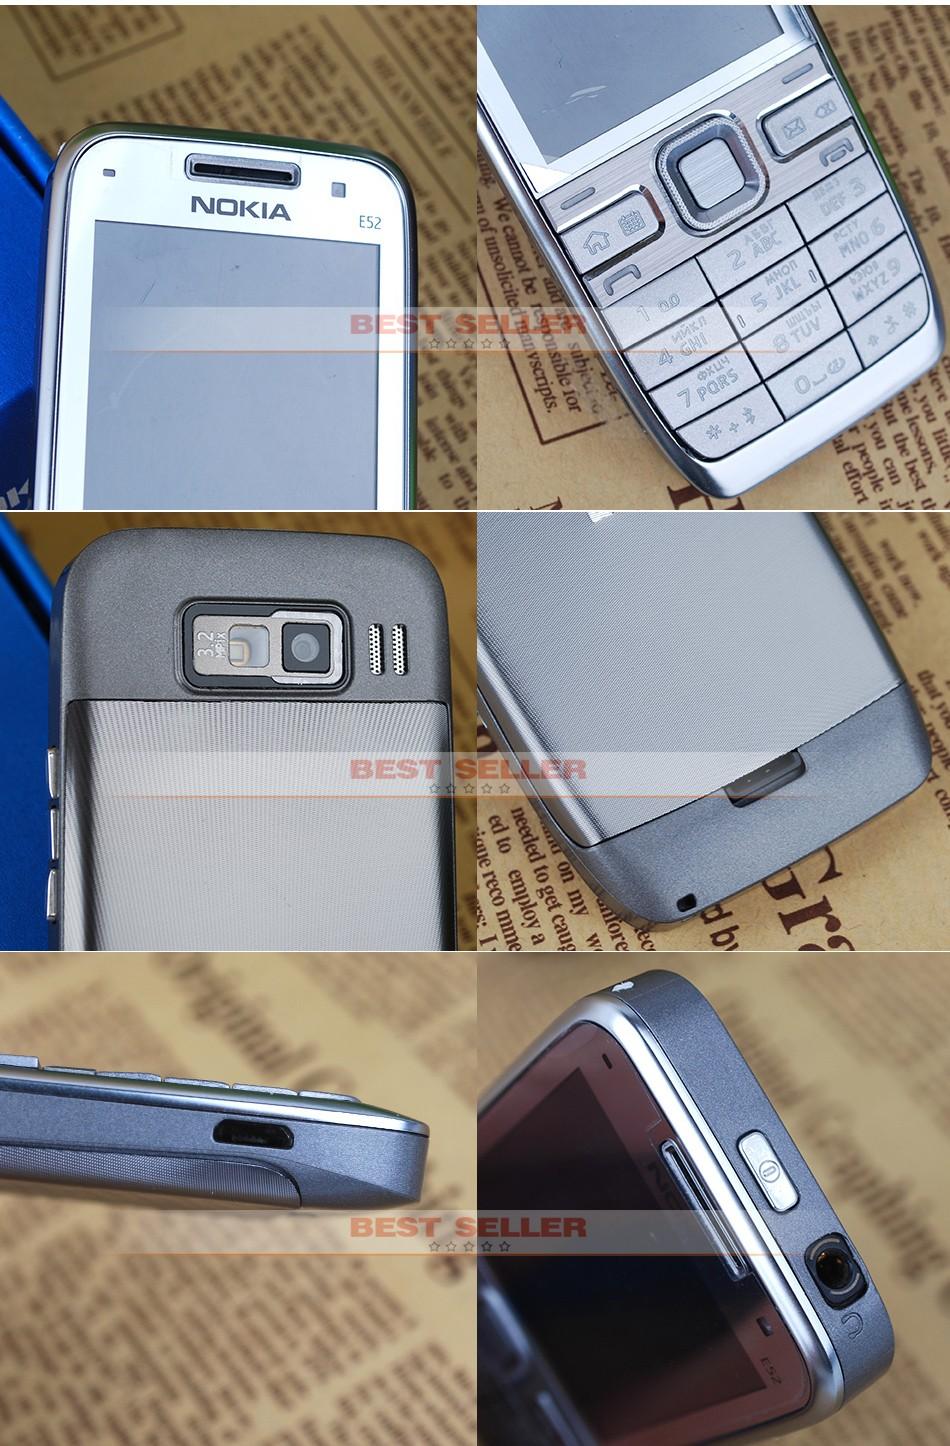 Refurbished phone Original Unlocked Nokia E52 GSM WCDMA cell phone Wifi Bluetooth GPS 3.2MP Camera black 5